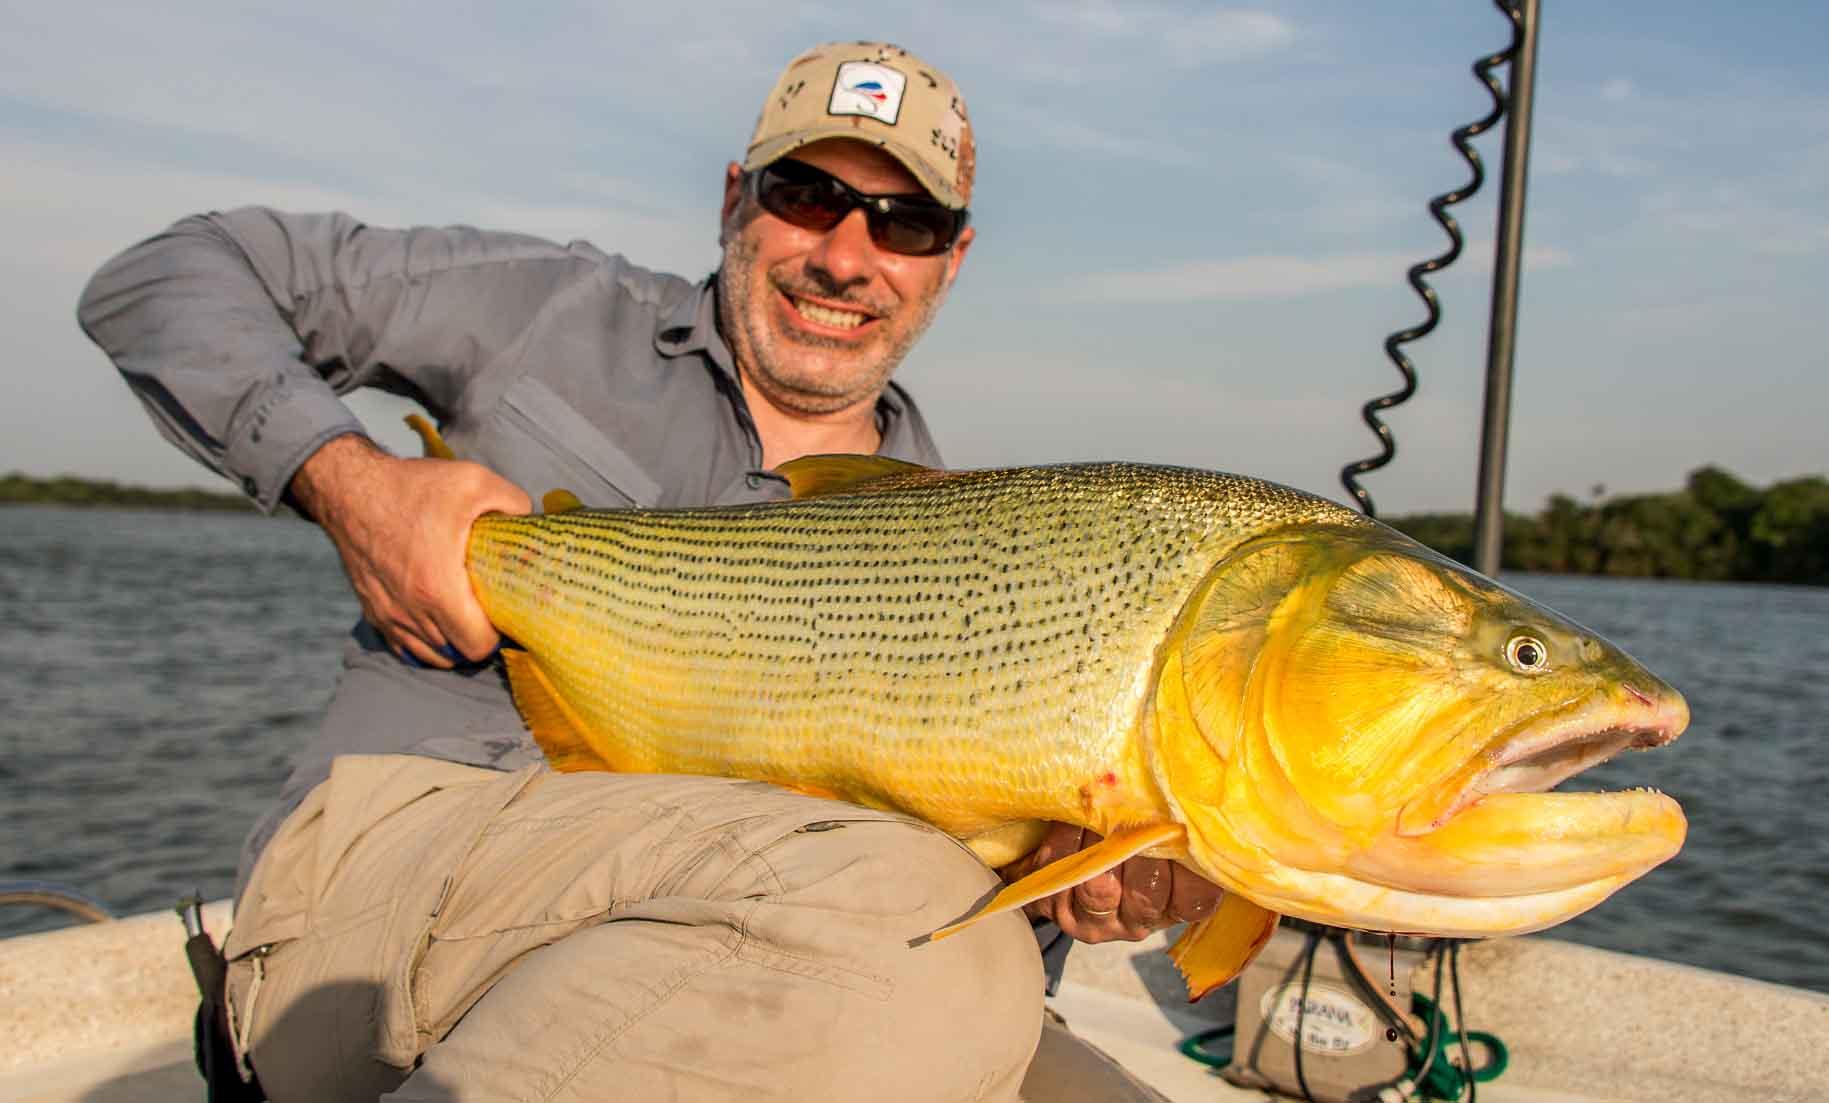 dorado in Argentina, Patagonia Fly Fisherman